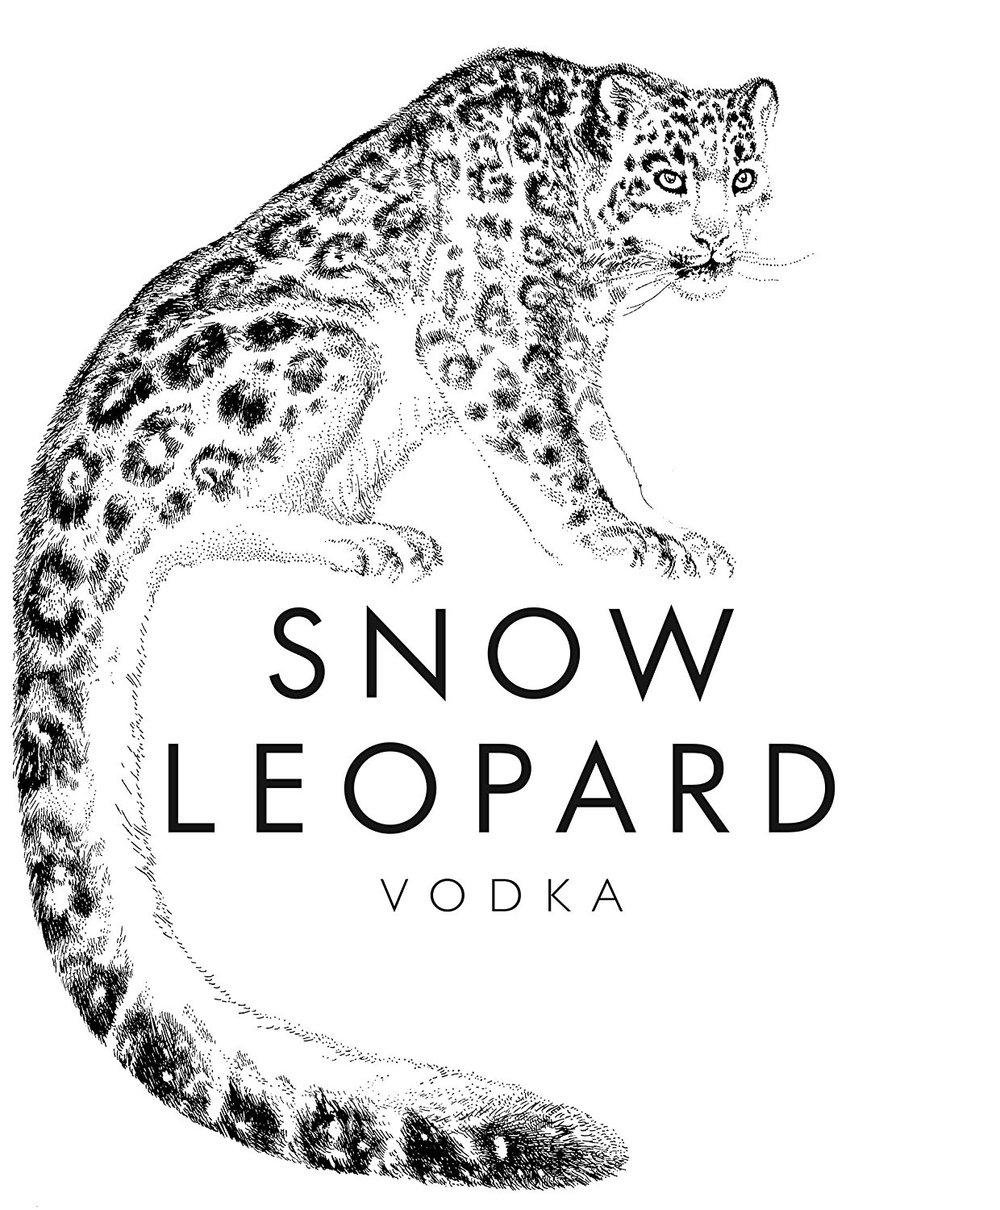 Snow leopard vodka.jpg